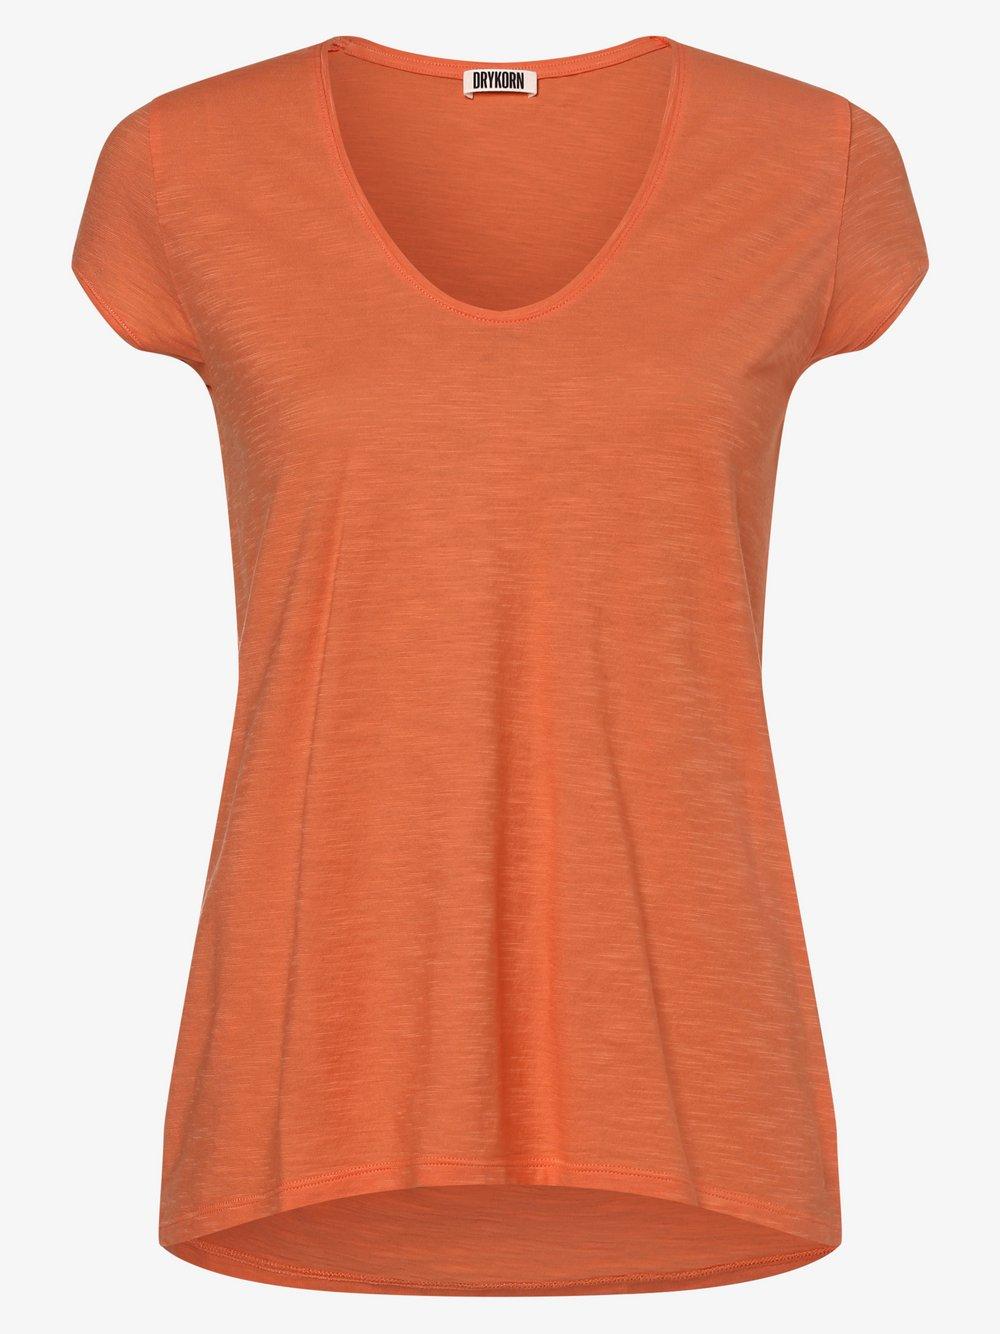 Drykorn - T-shirt damski – Avivi, pomarańczowy